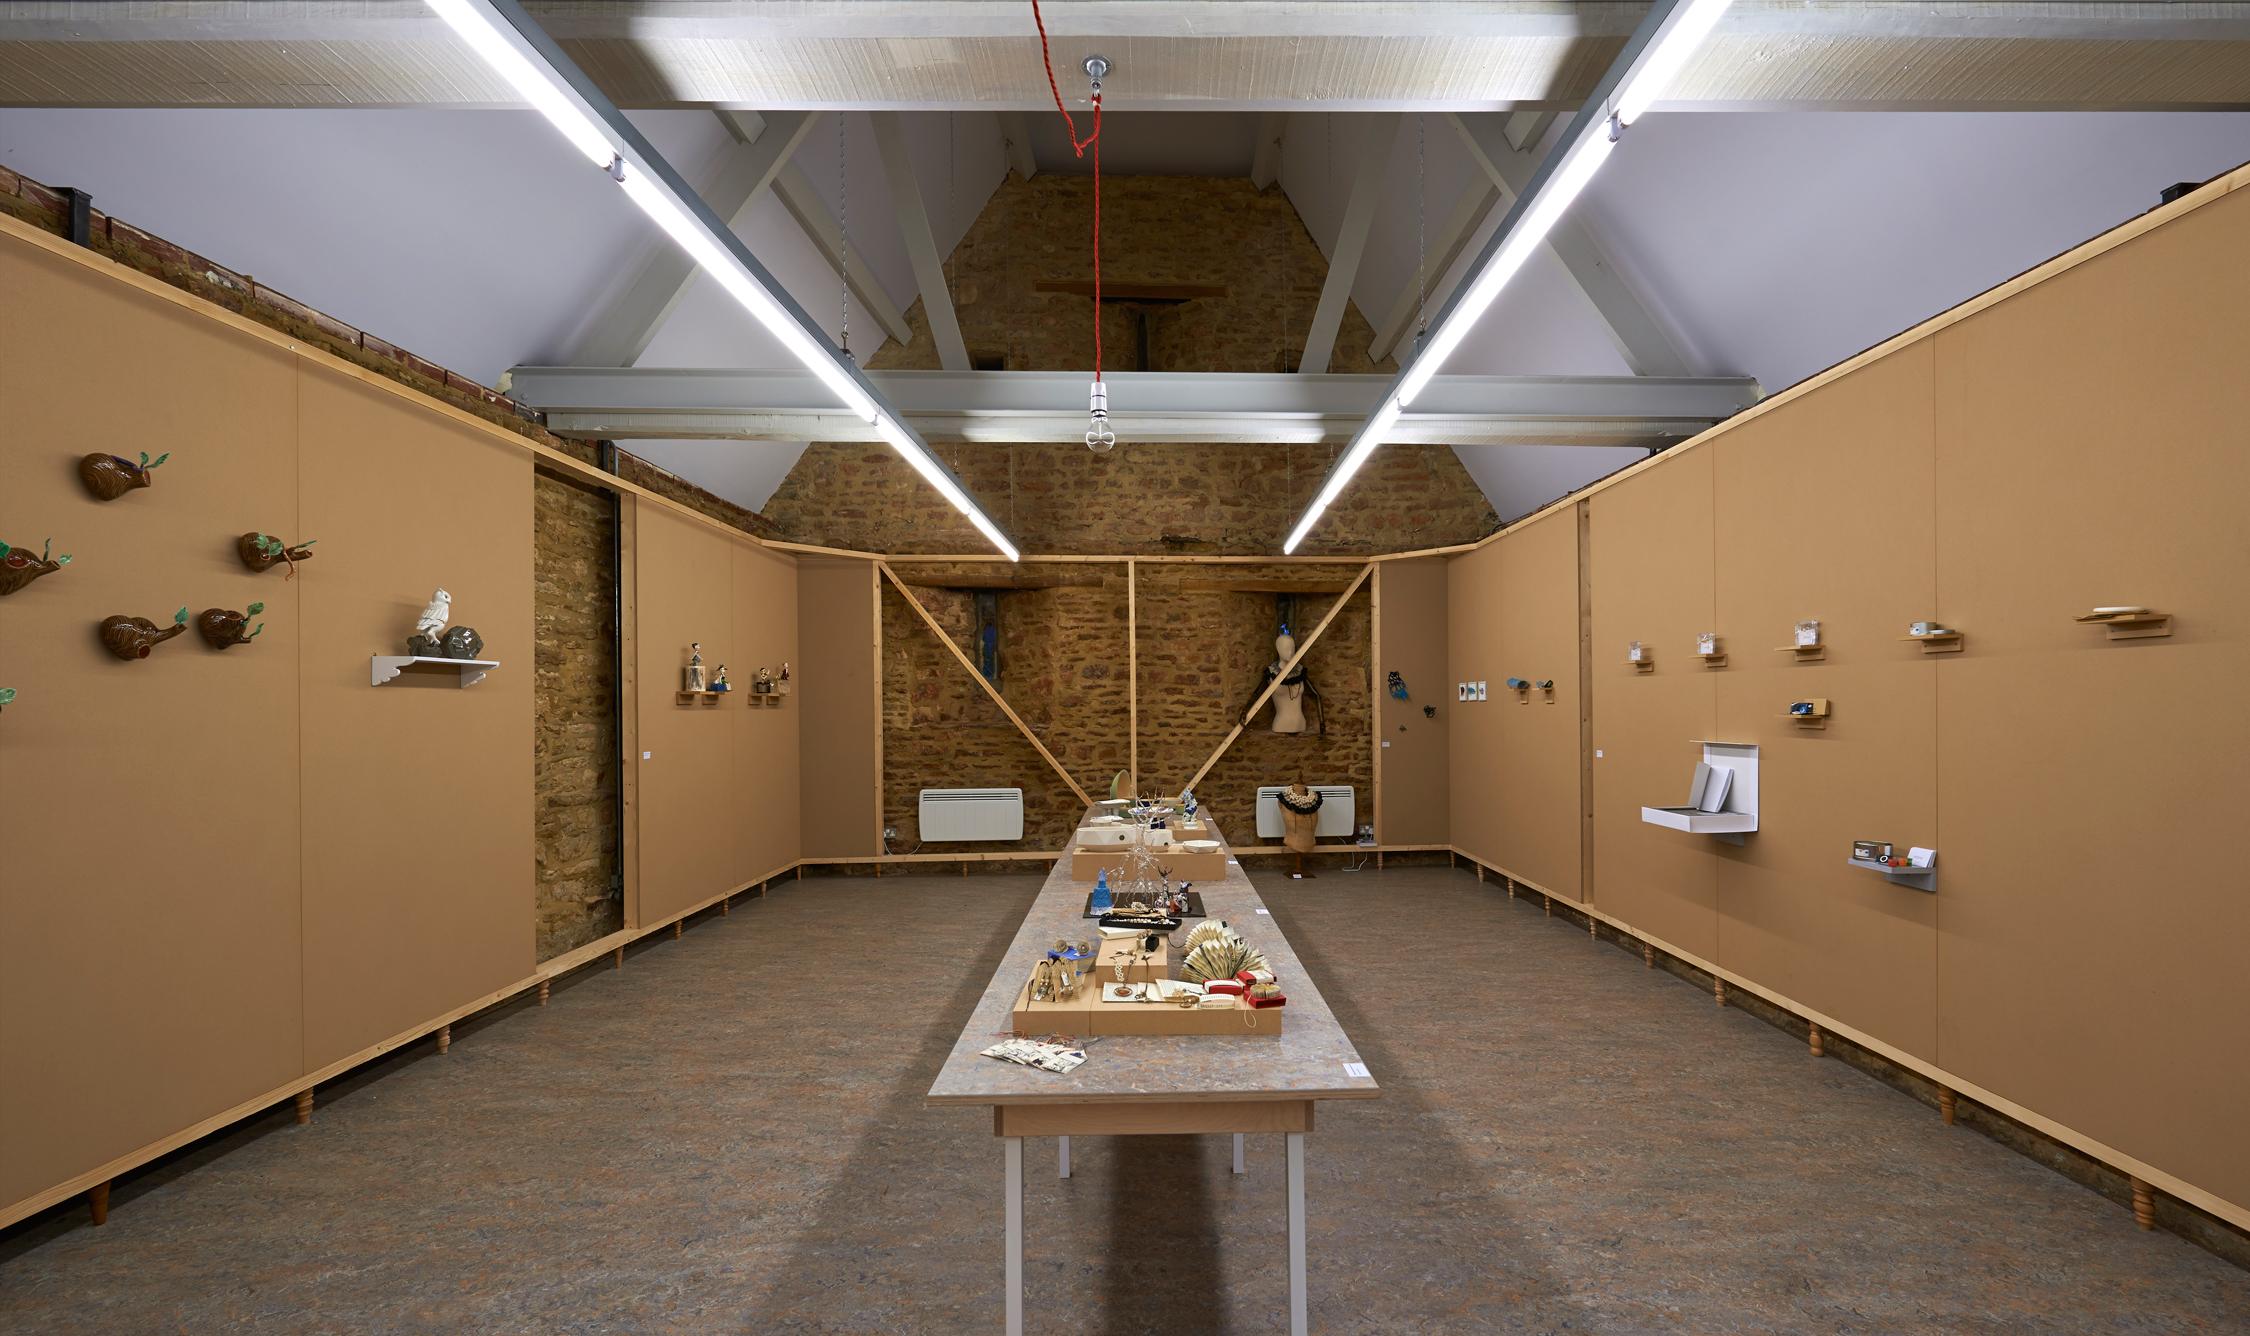 Wonderland-Milton-Keynes-Arts-Center-1.jpg